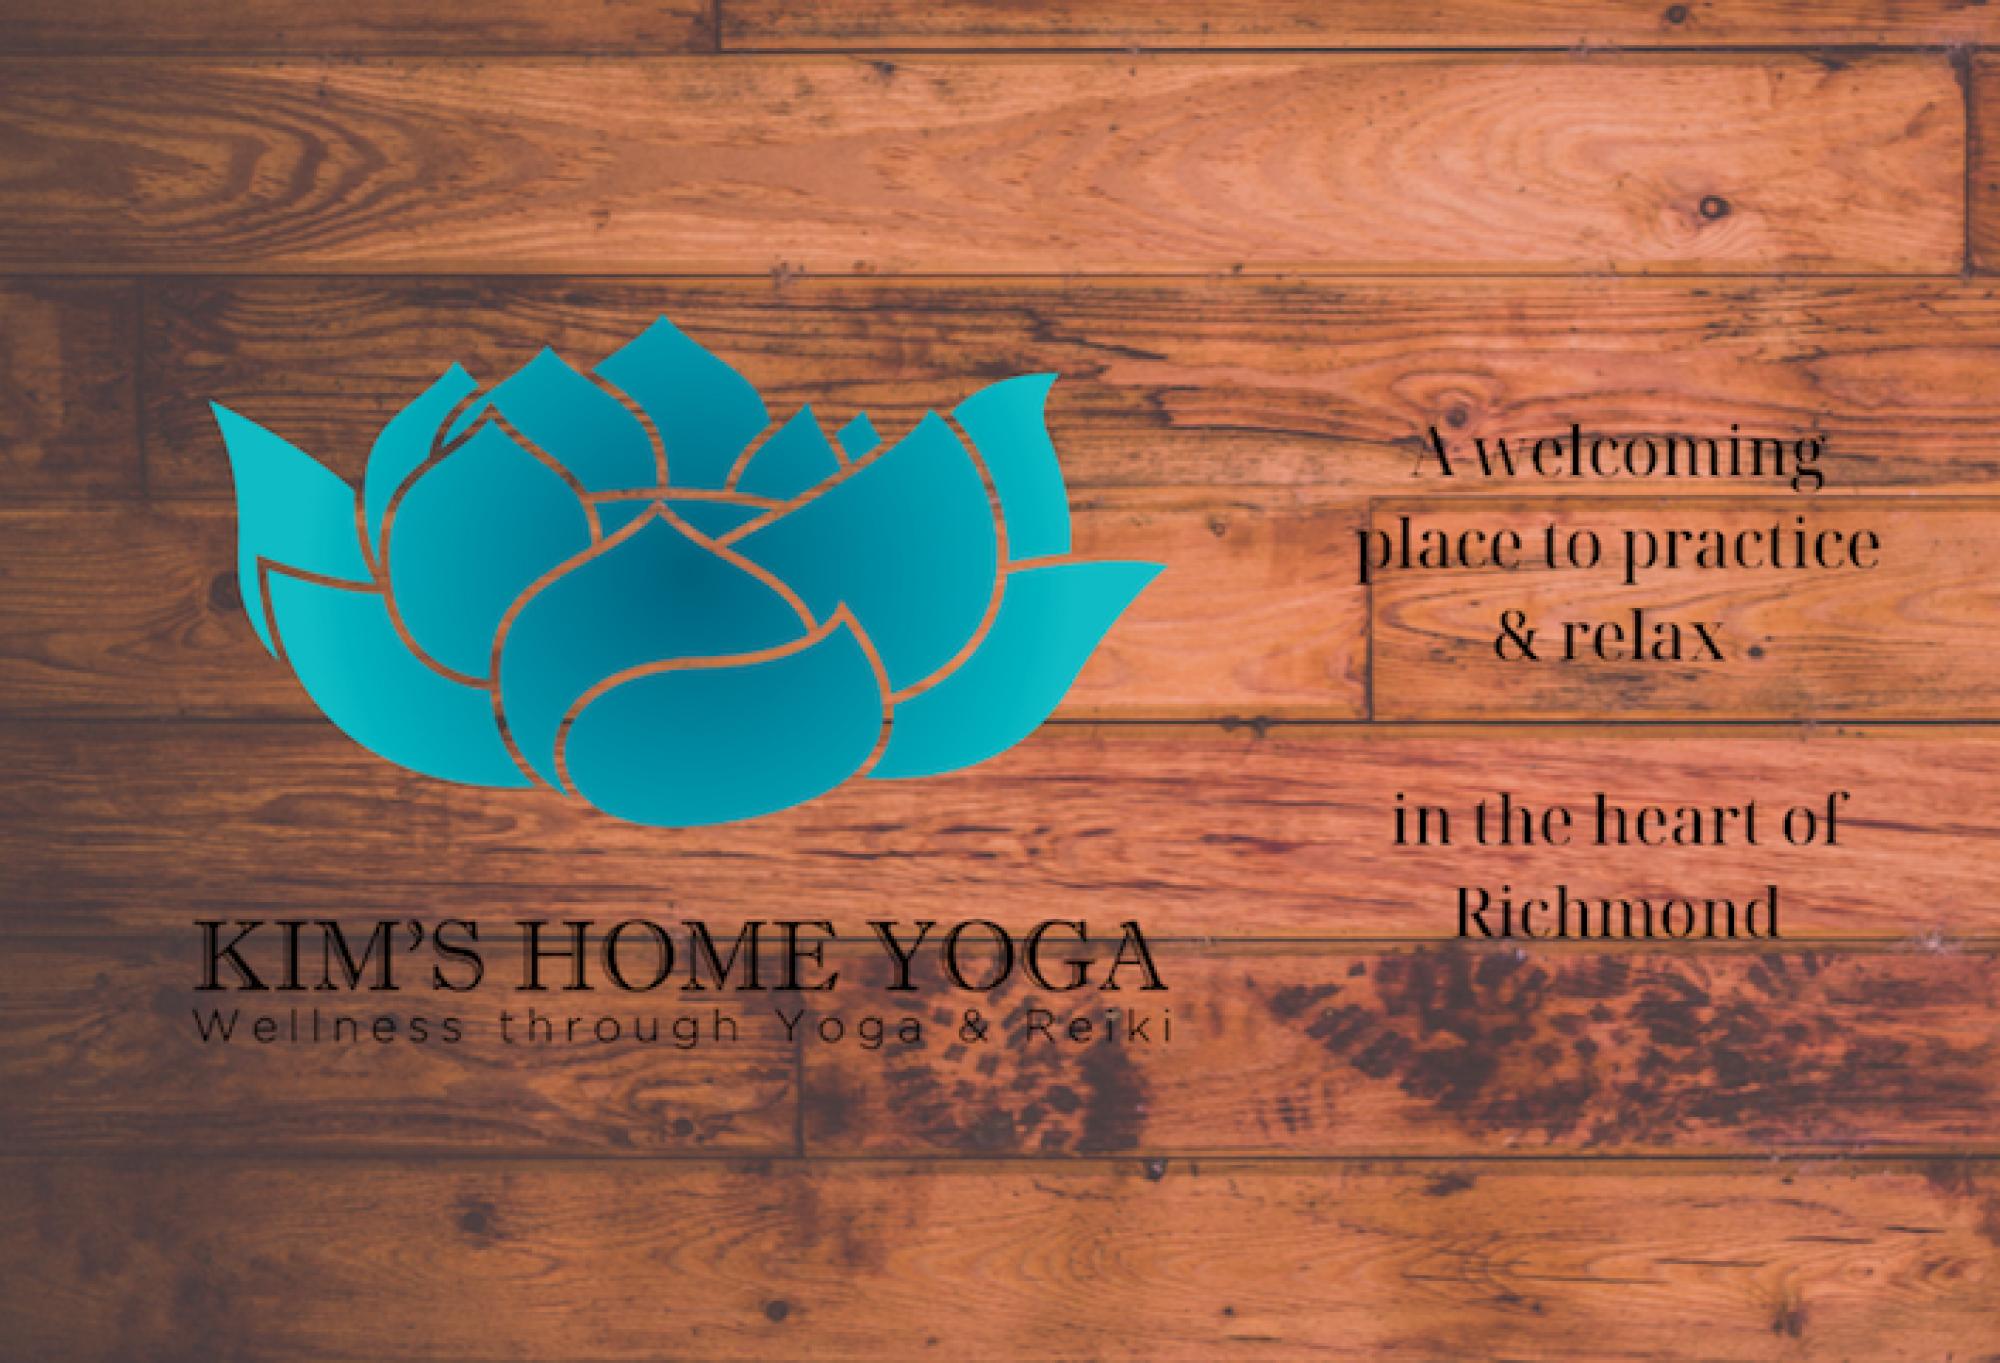 Kim's home yoga